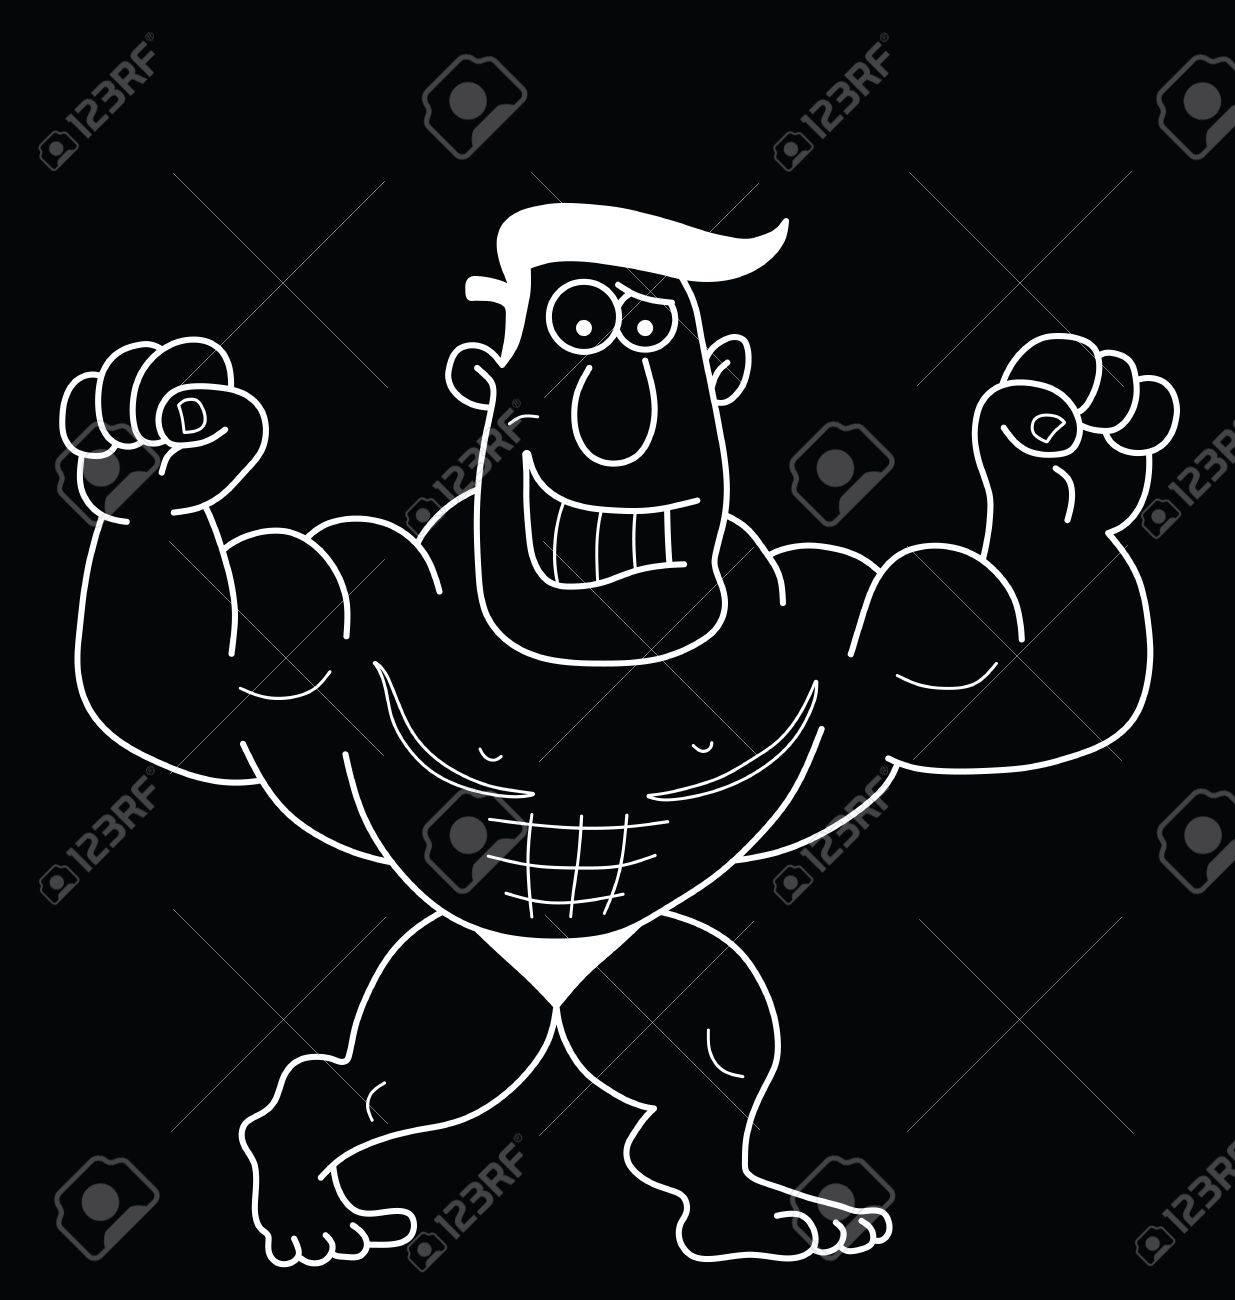 Monochrome Outline Cartoon Strongman Isolated On Black Background 1235x1300